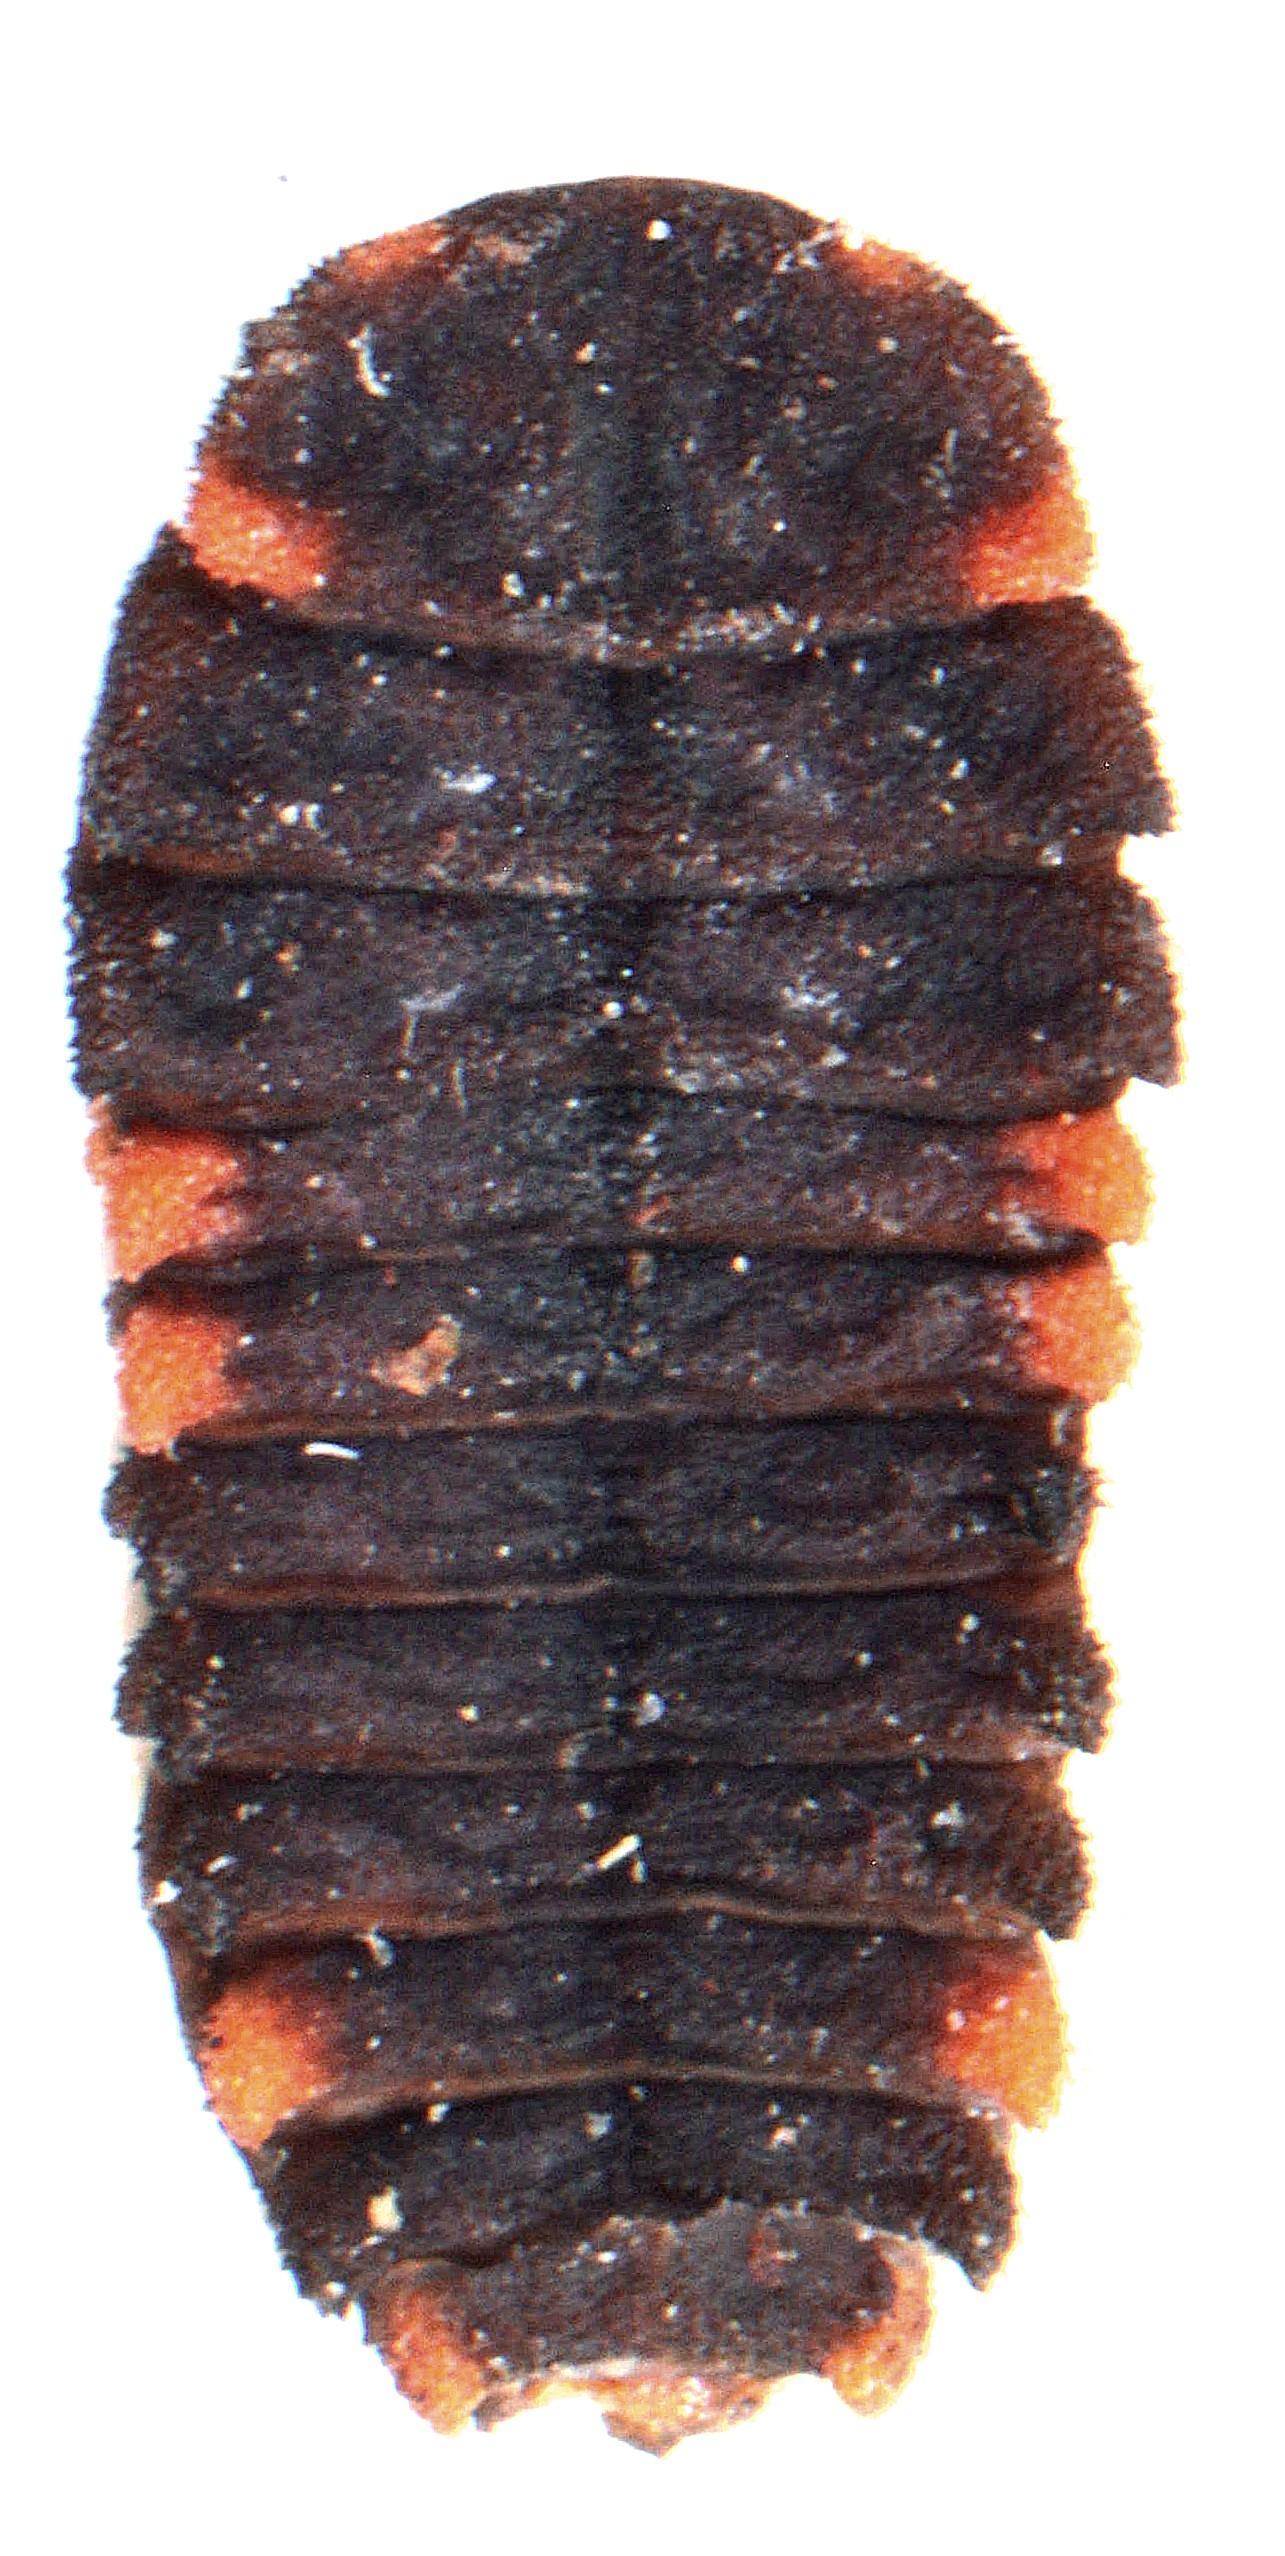 Endomychus coccineus 7